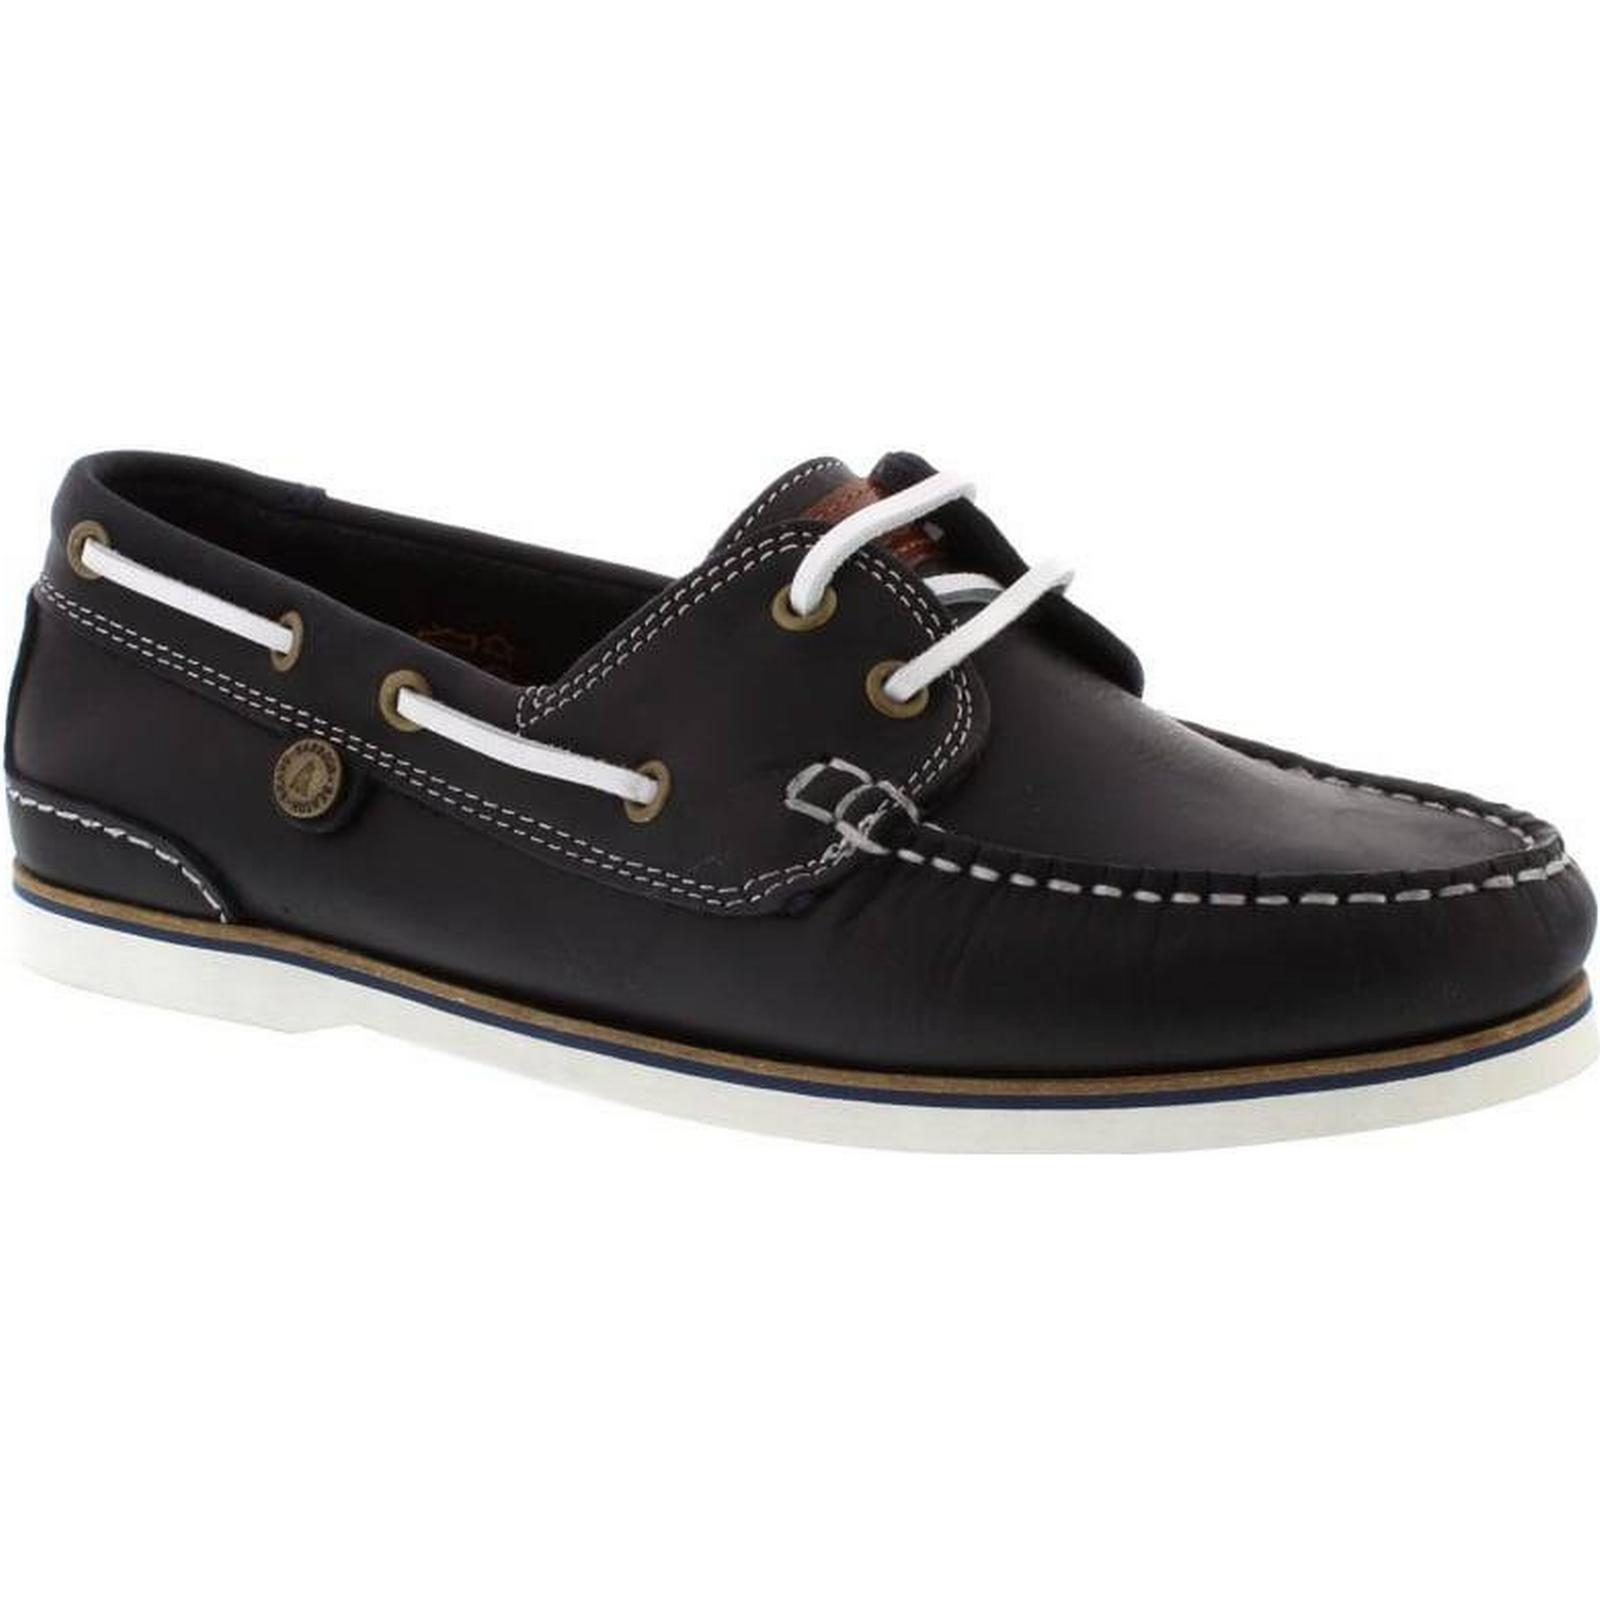 Barbour Blue Bowline Boat Shoe - Blue Barbour Leather Size: 6 UK ffcf04